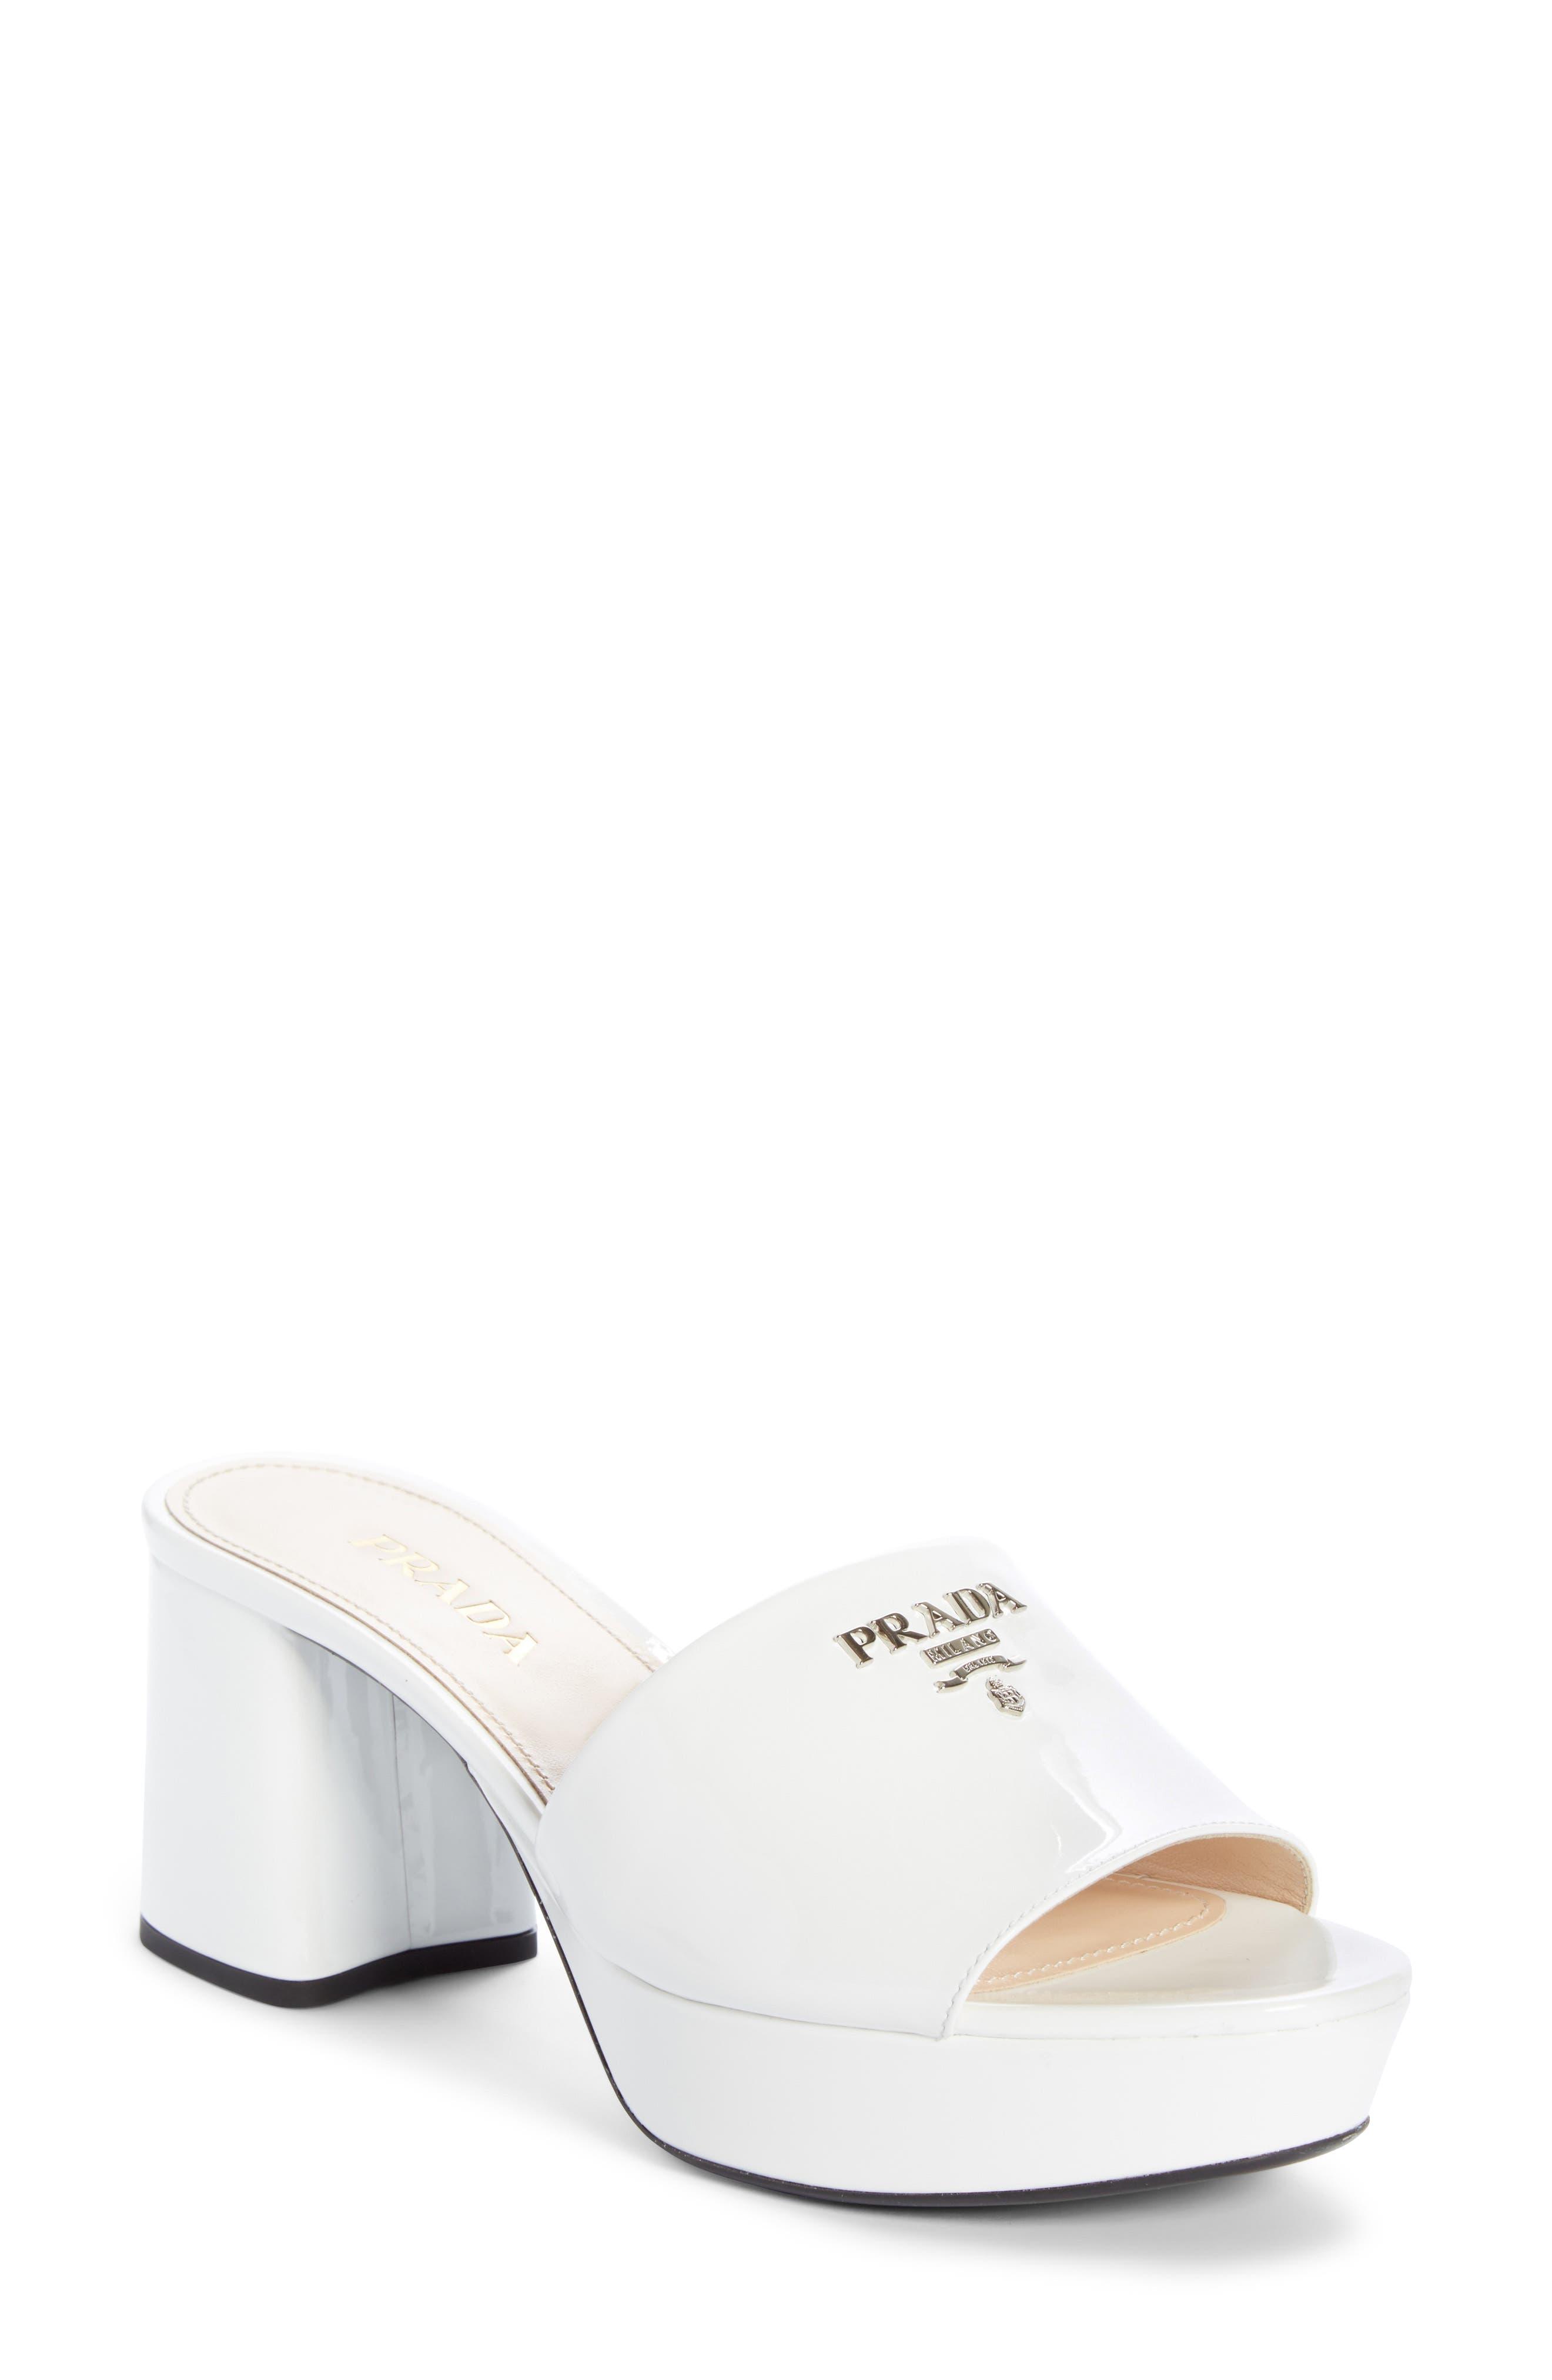 57efb0f1a3 Women's Prada Sandals   Nordstrom